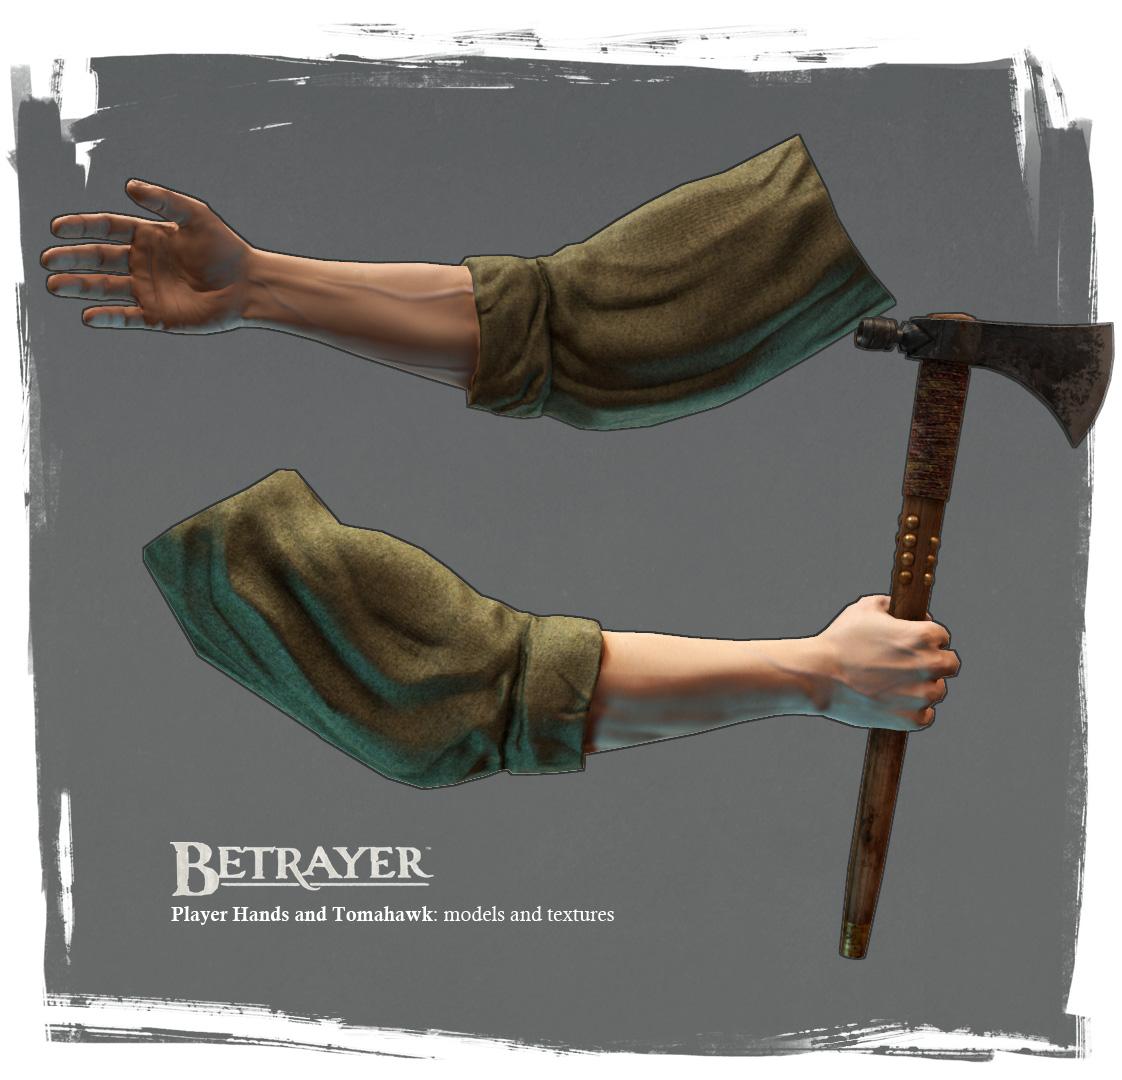 PlayerHands.jpg